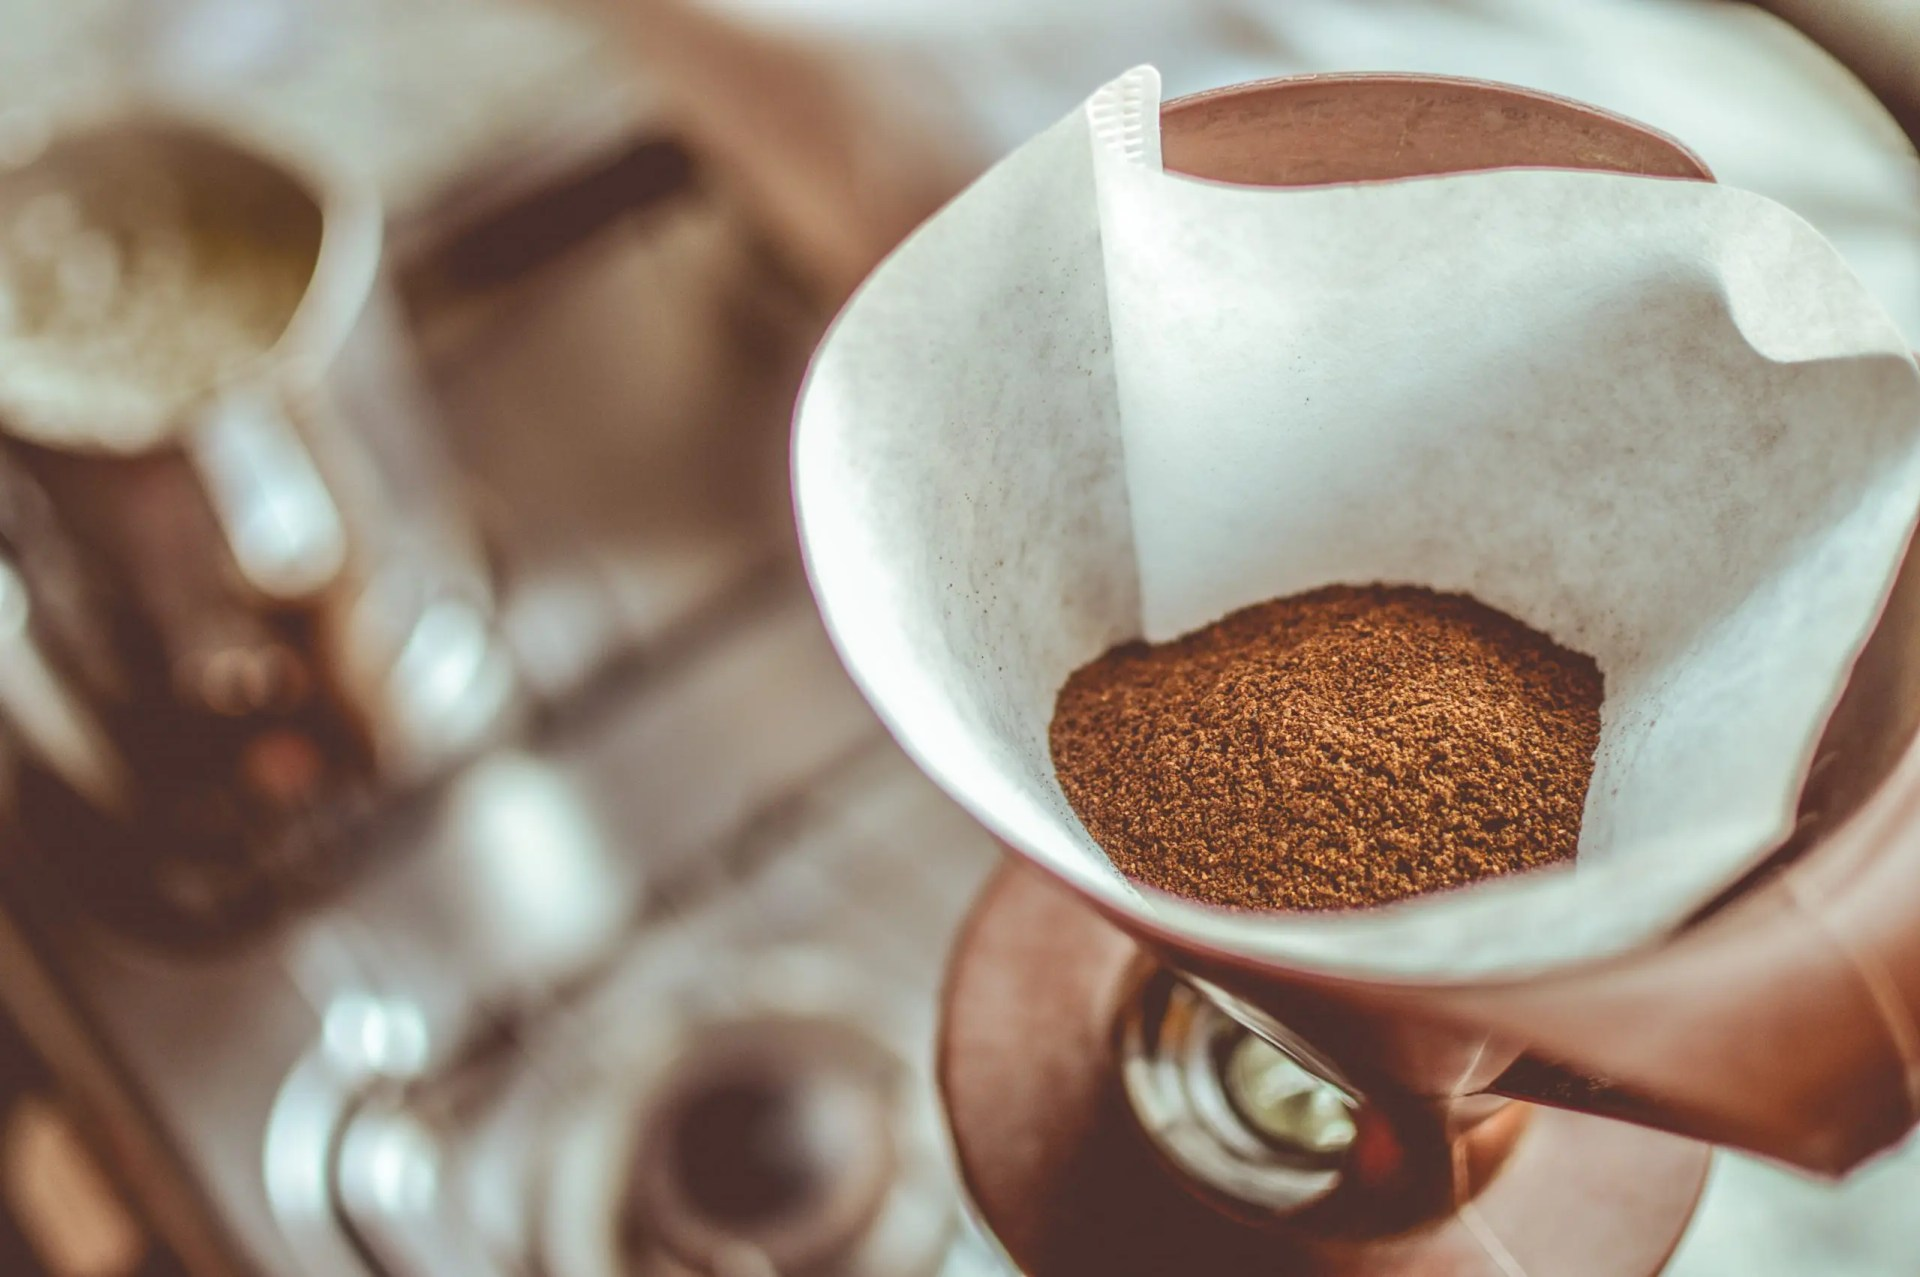 coarse grind in a coffee maker